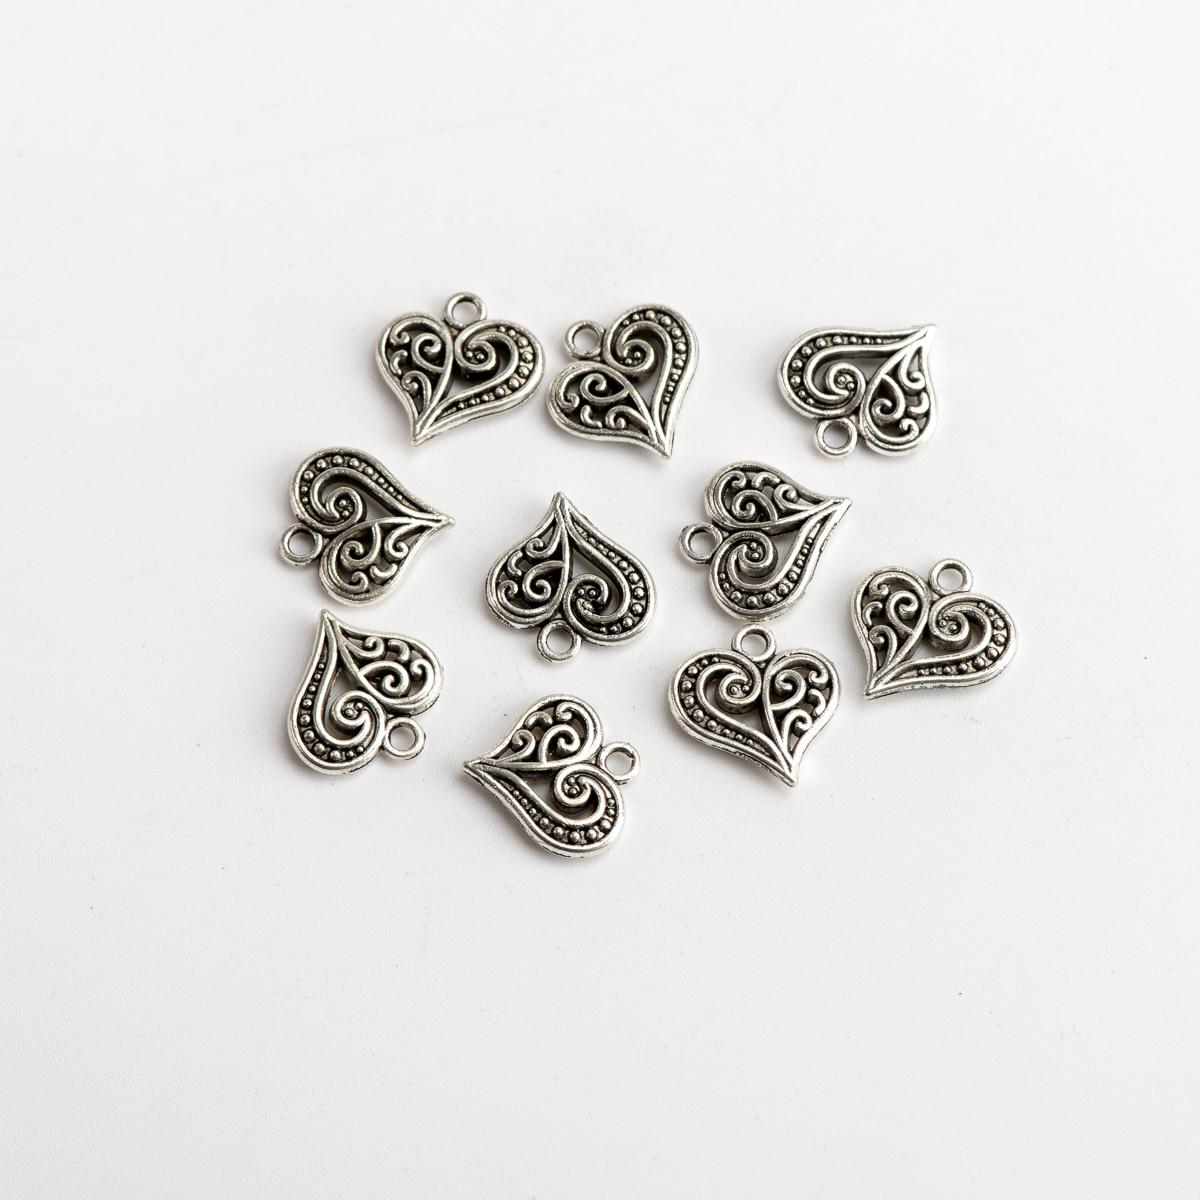 Metal Heart Pendant  Jewelry Accessories DIY Jewelry Making Findings Handicraft Accessories For Jewelries Needlework #JZ401